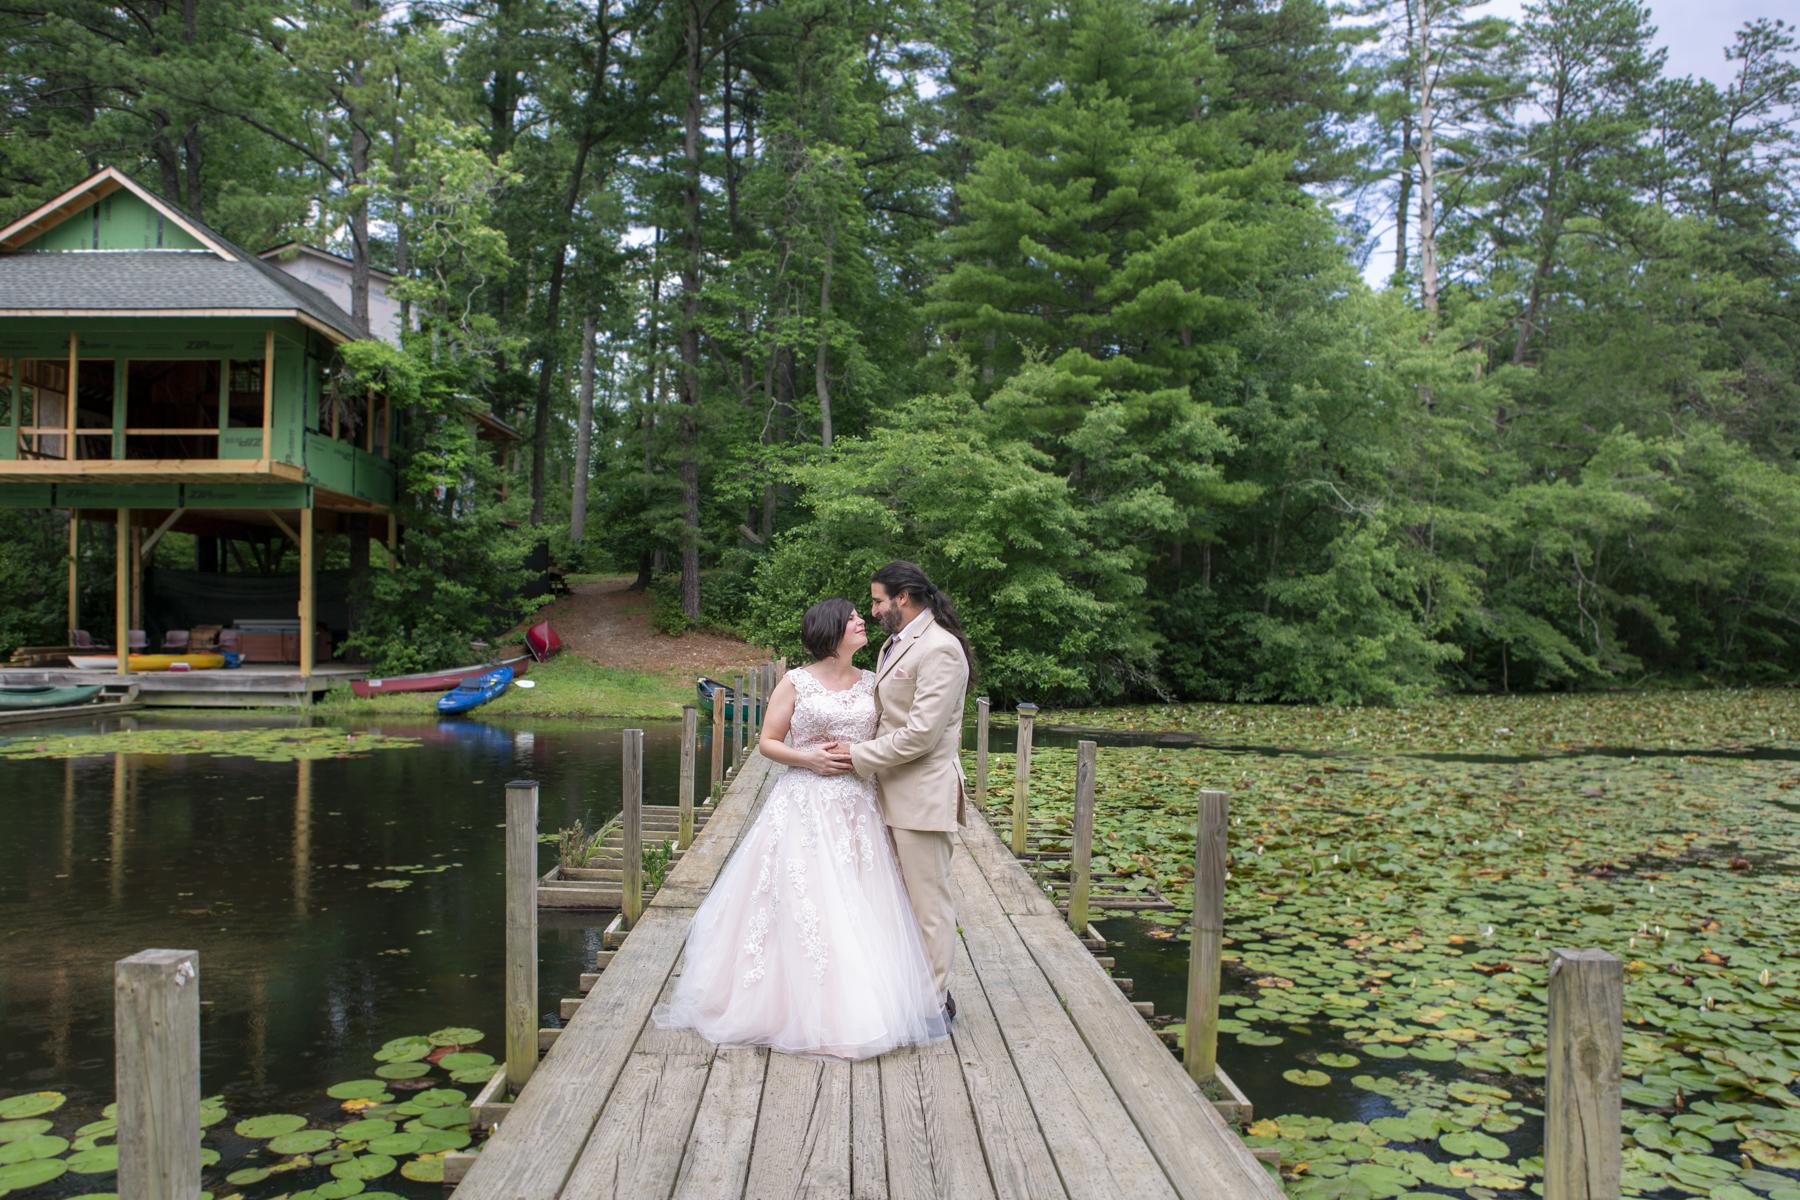 Avyanna and Phoenix Wedding 2019_photos by Studio Misha_BLOG-73.jpg